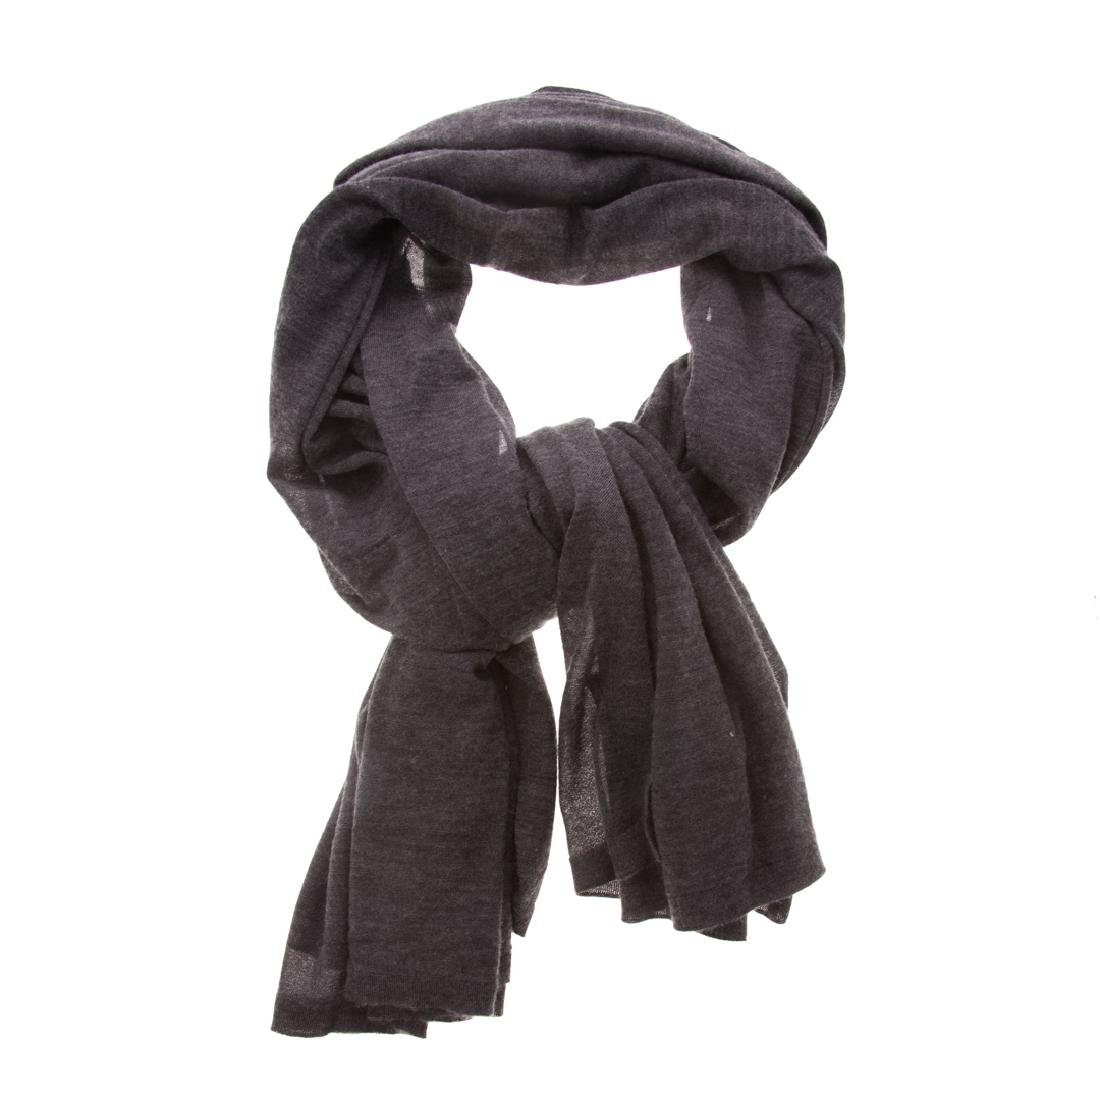 A Hermès Cashmere & Silk Grey Scarf